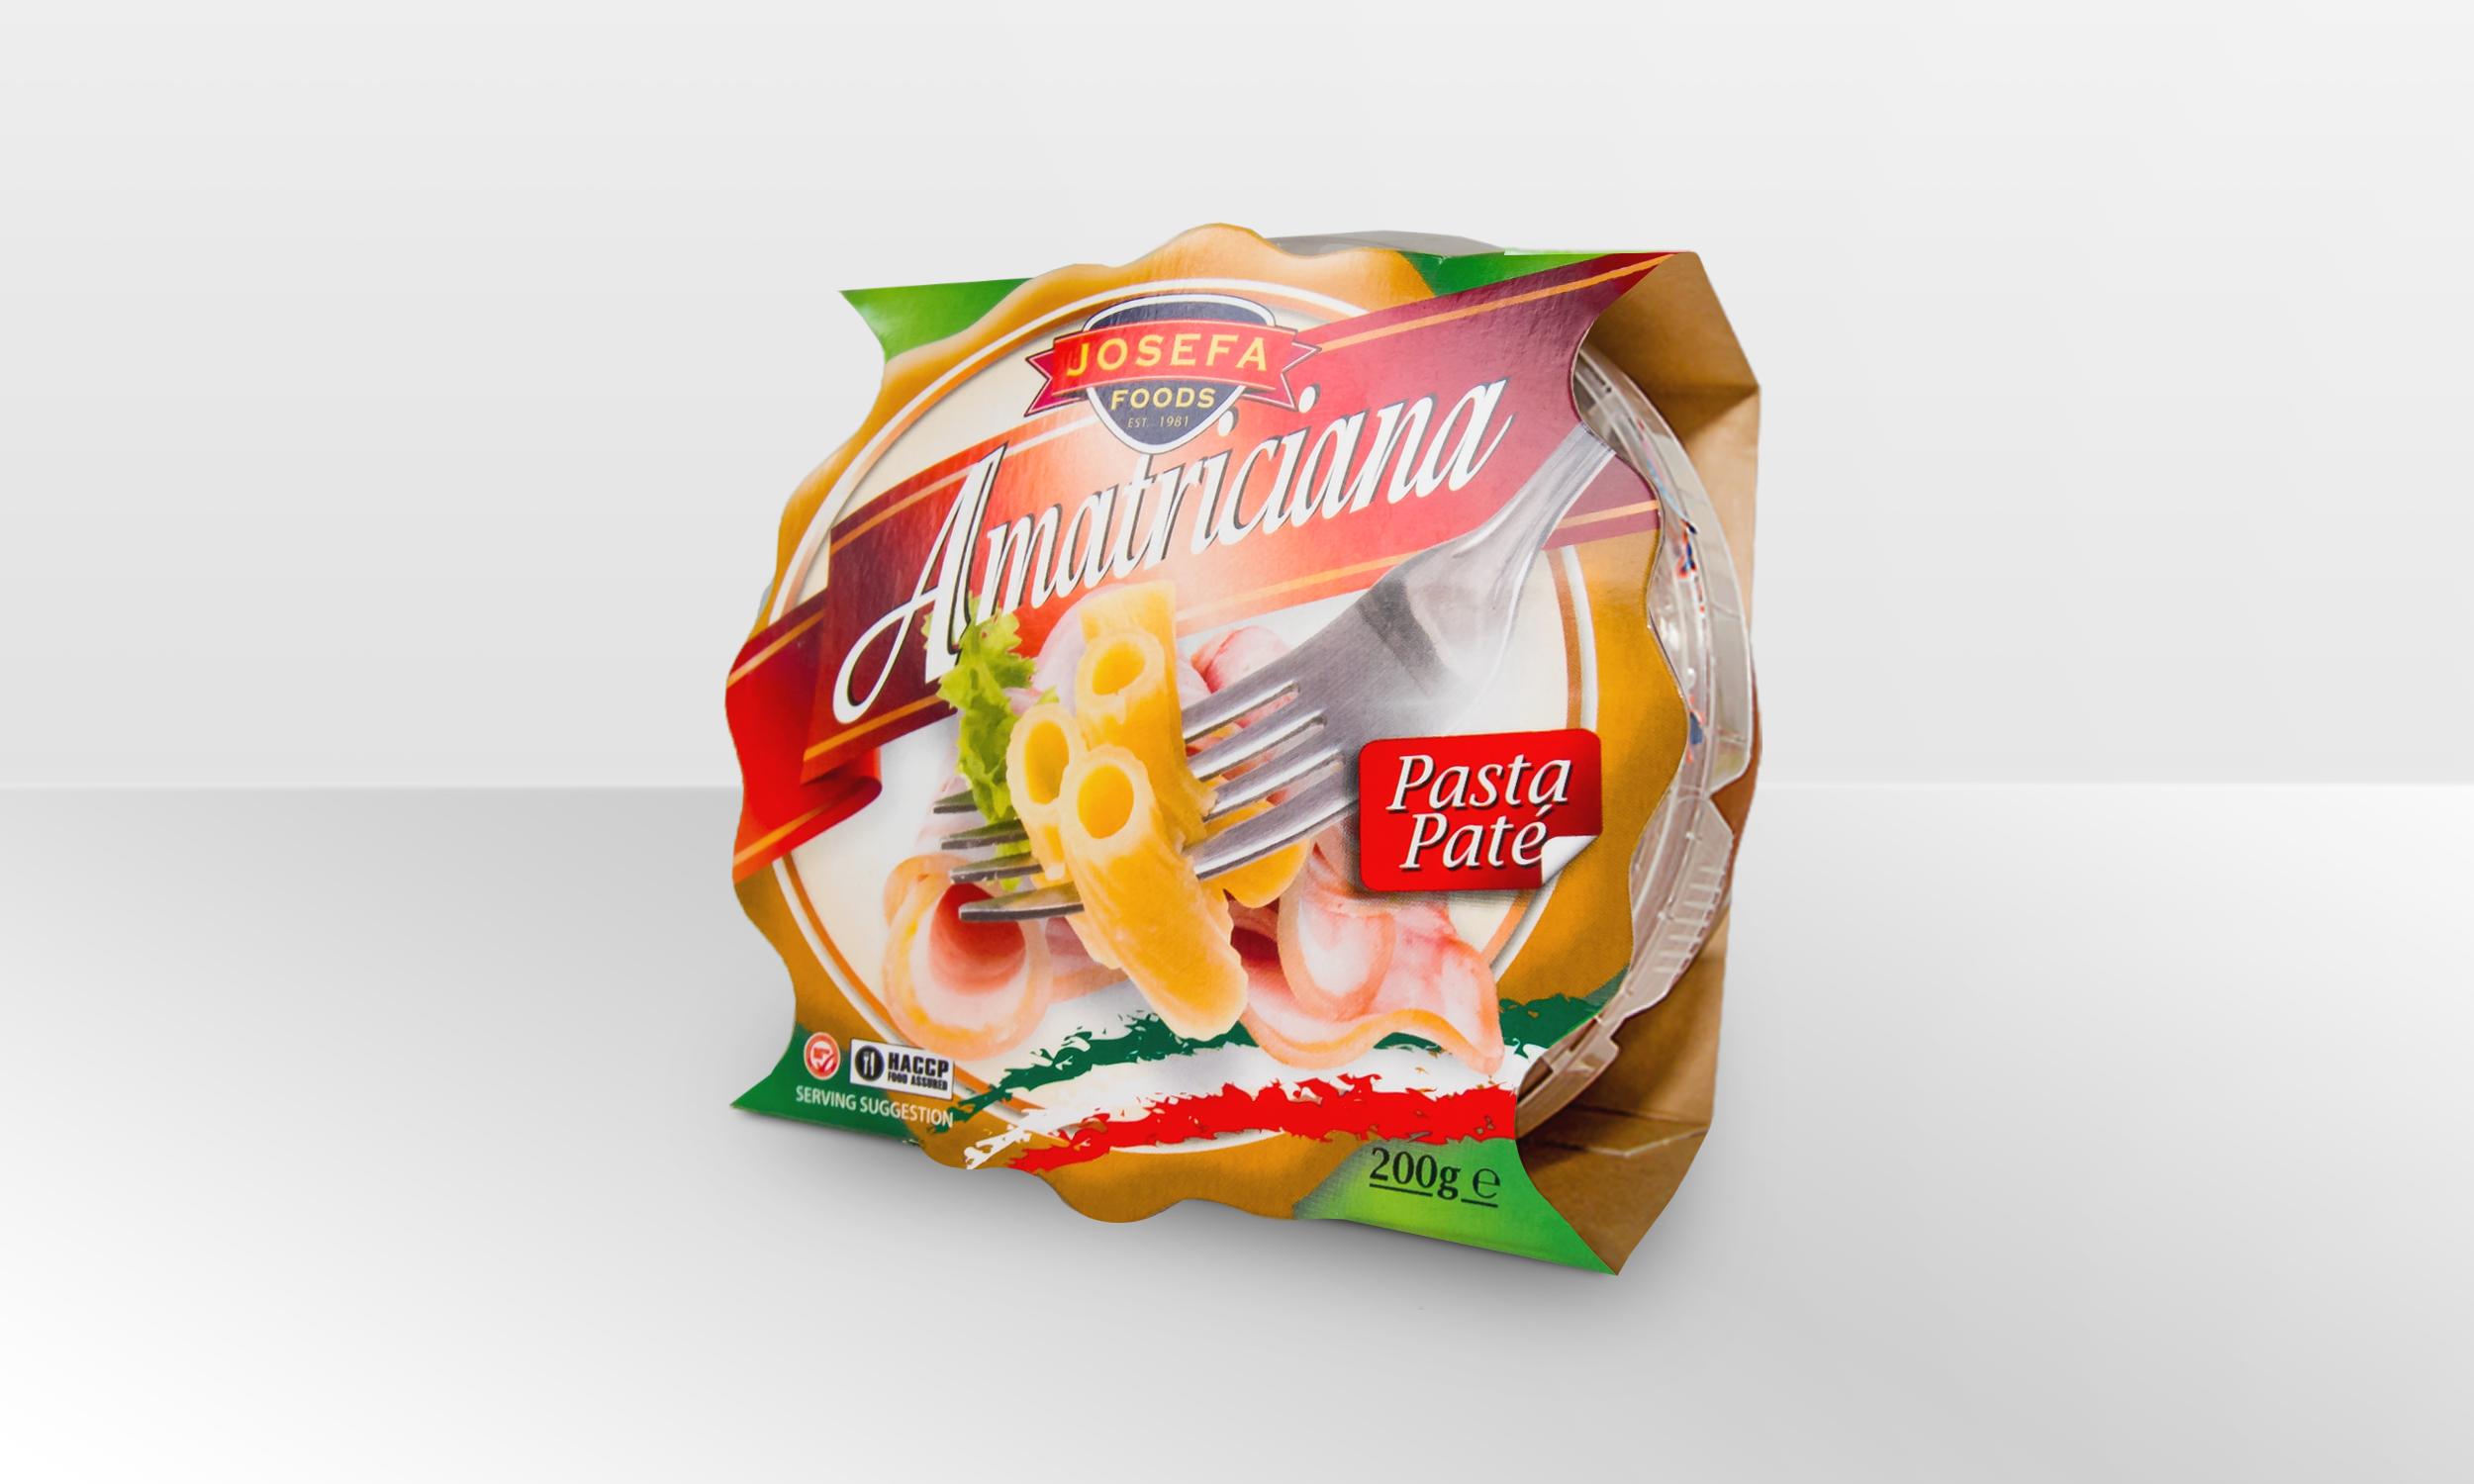 Josefa Amatriciana  Pasta Pate